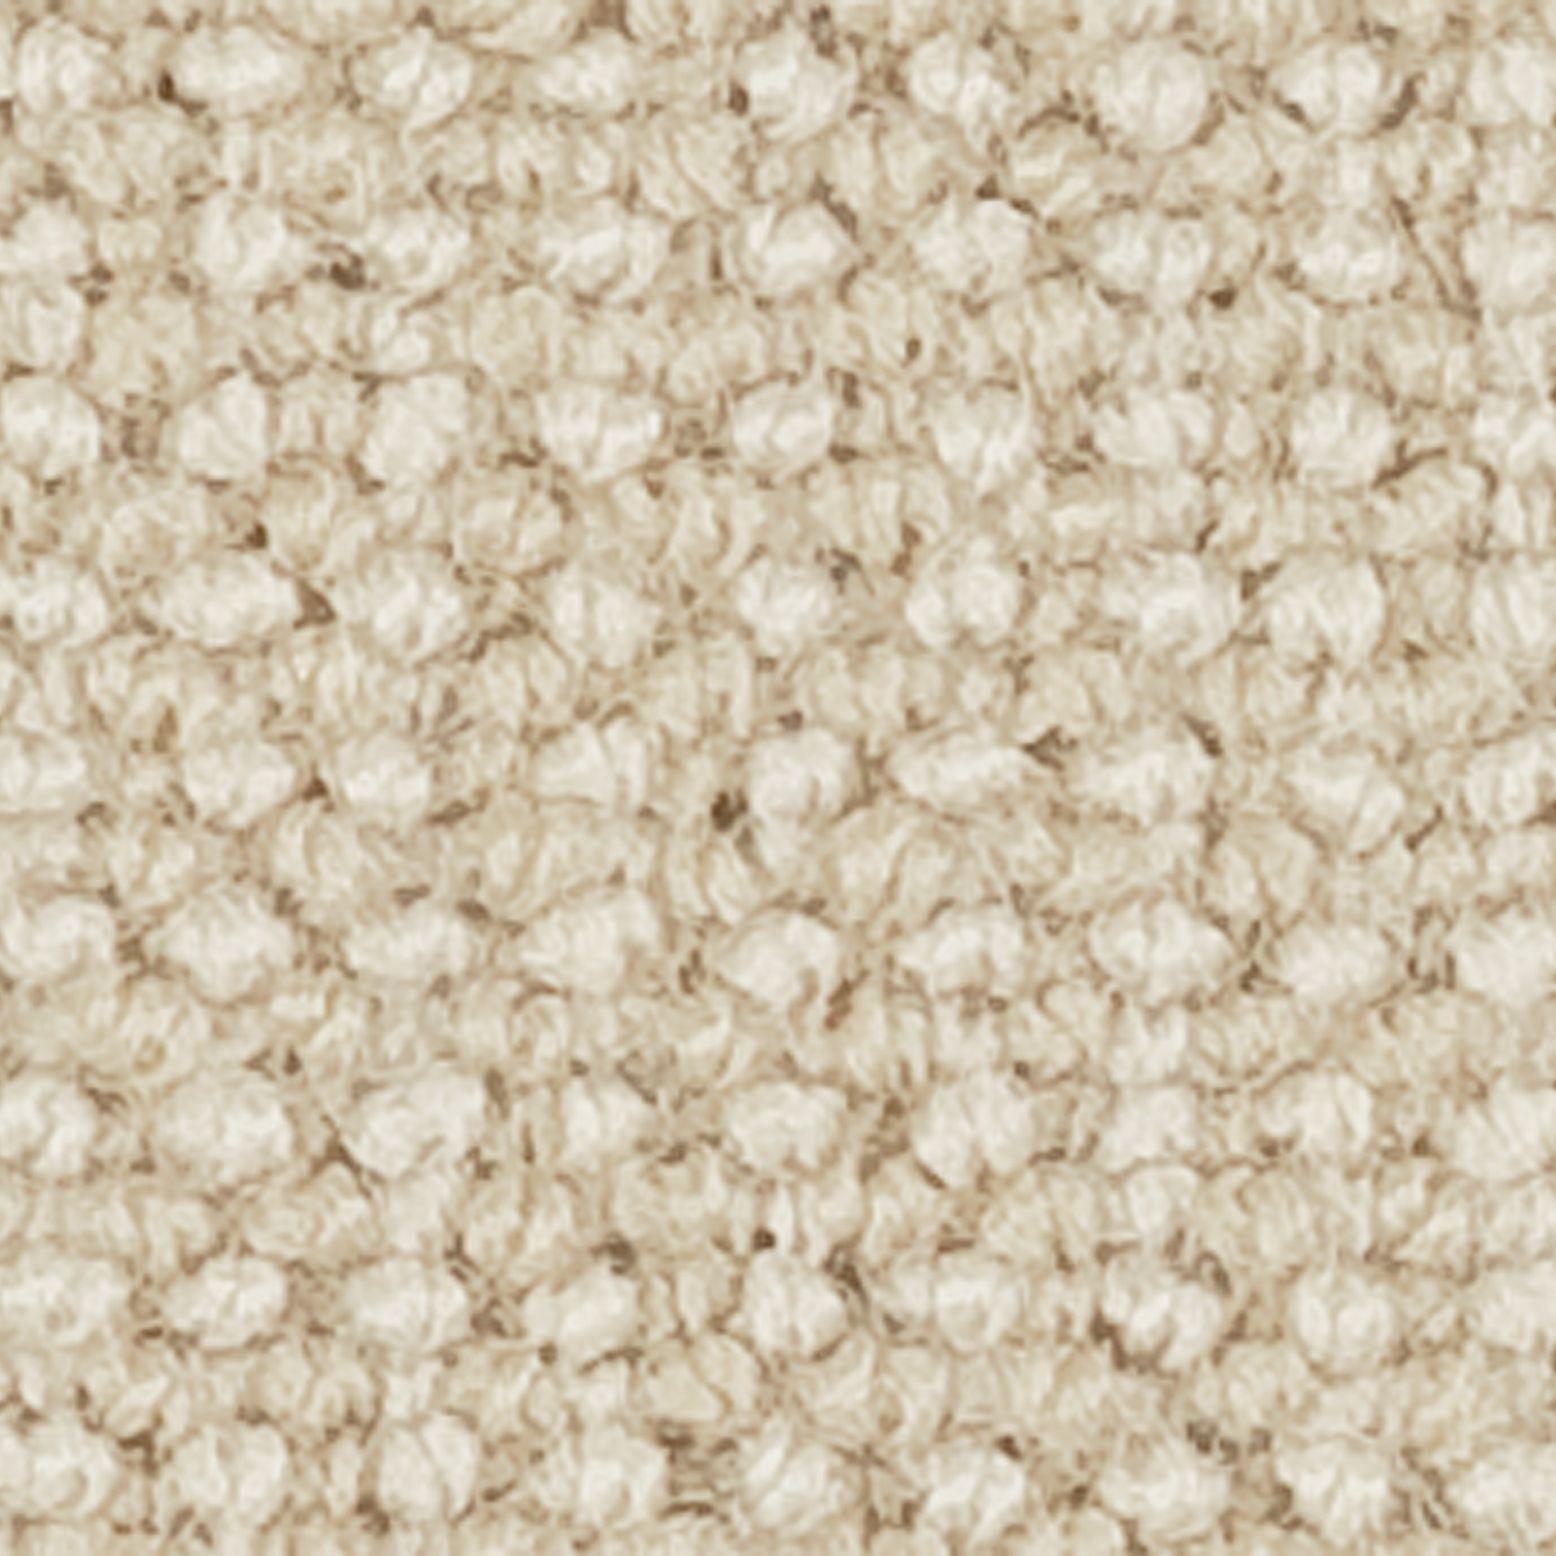 Westex Ultima Twist Carpet Stone In 2020 Carpet Fitting Cost Of Carpet Moving Furniture